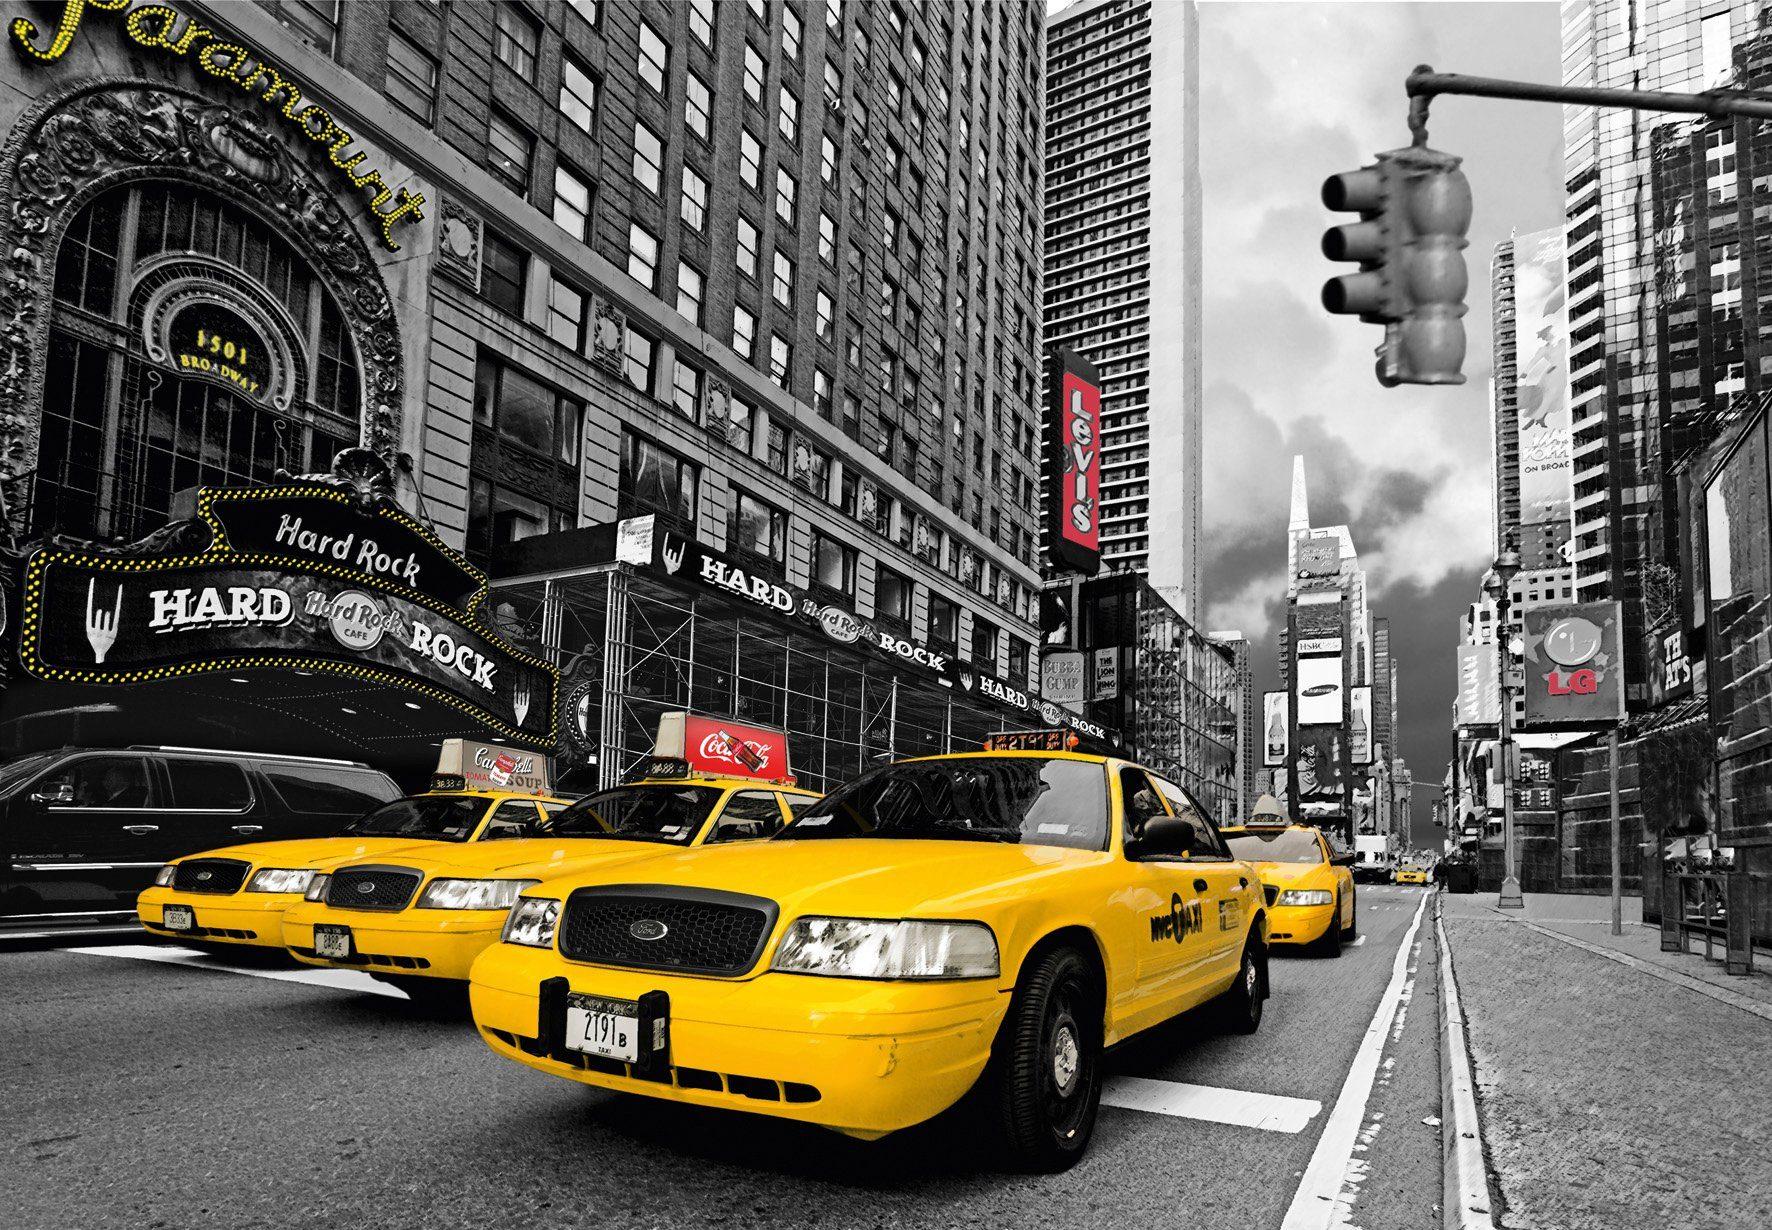 PAPERMOON Fototapete »Time Square HR Cafe«, Vlies, 7 Bahnen, 350 x 260 cm